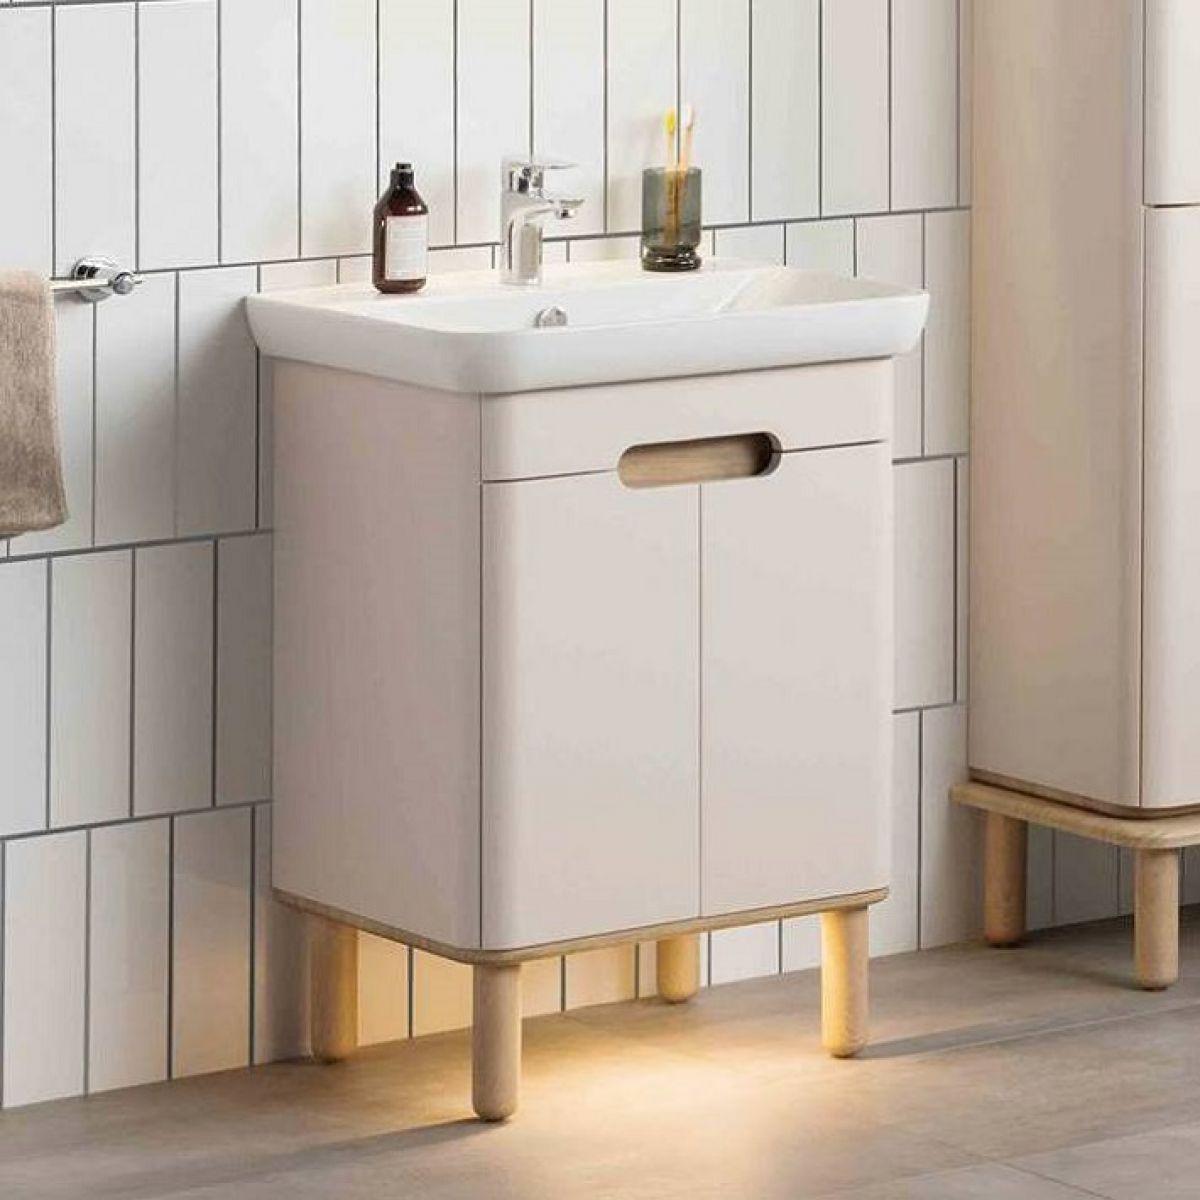 Vitra Sento 2 Door Vanity Unit Vitra Bathrooms Vanity Units Victorian Bathroom Sinks